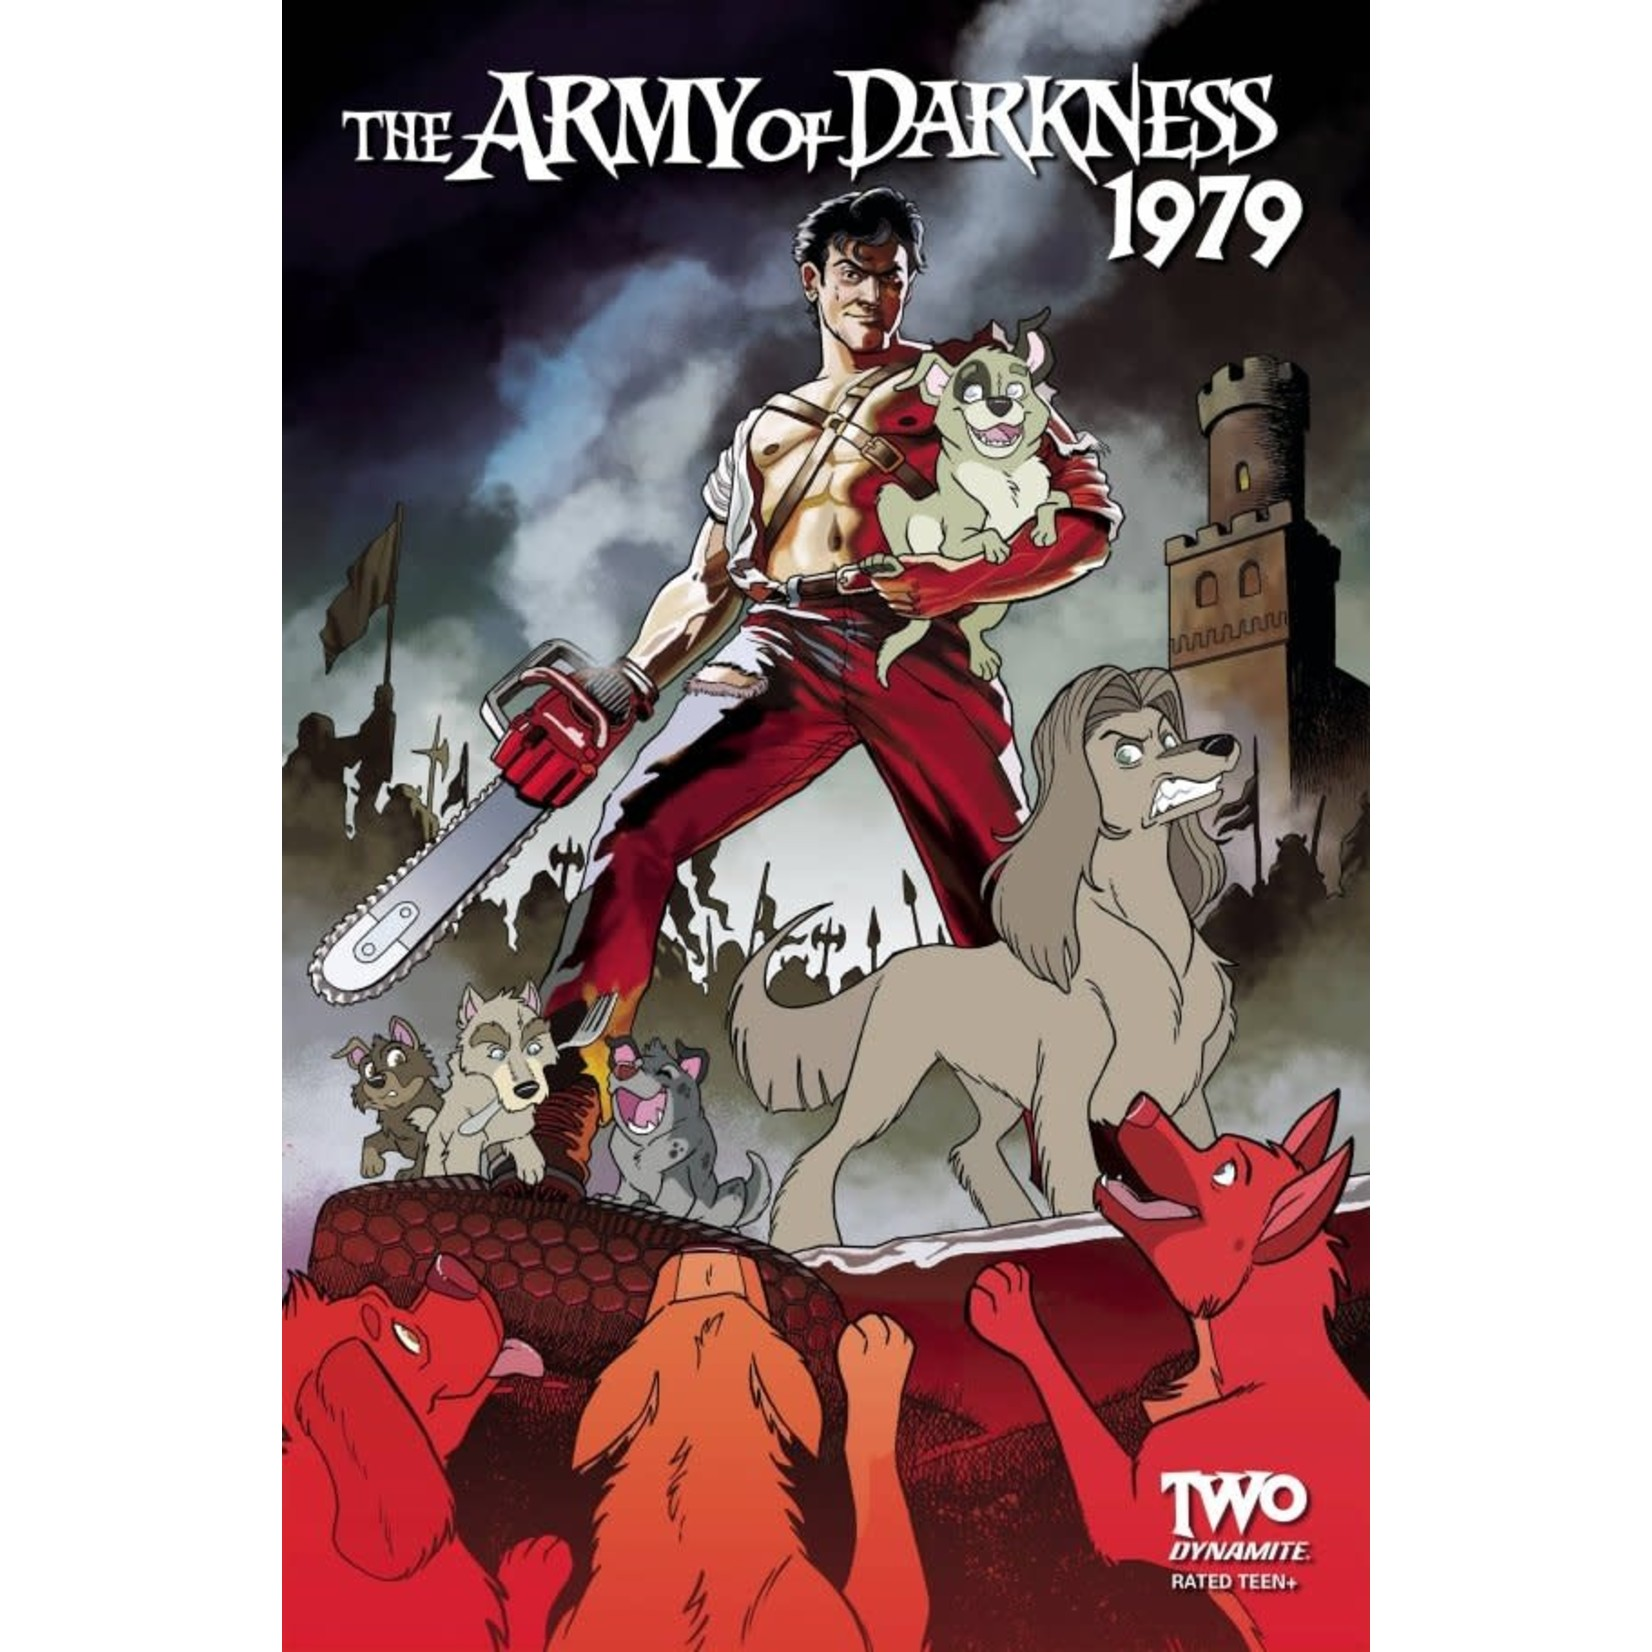 Dynamite Army of Darkness 1979 #2 Cover M FOC Bonus Fleecs